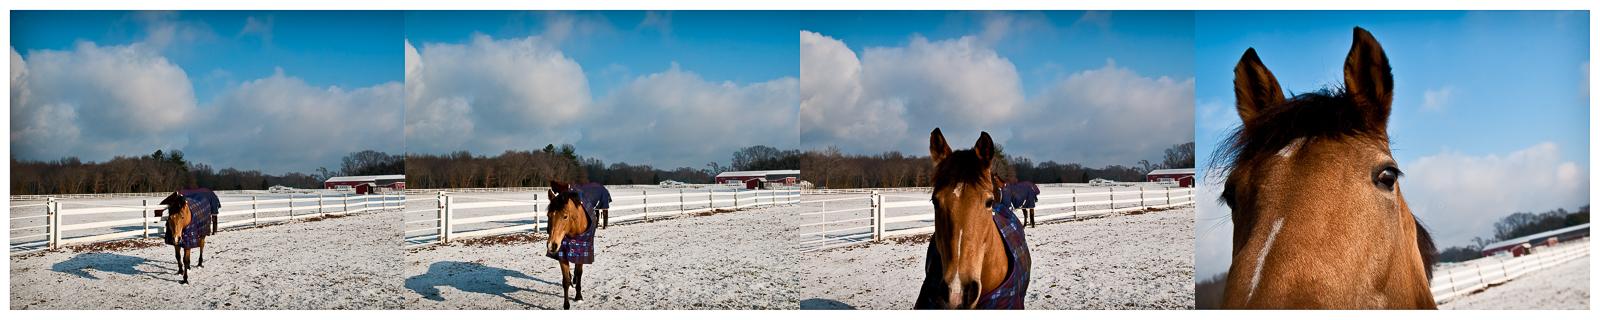 horse-